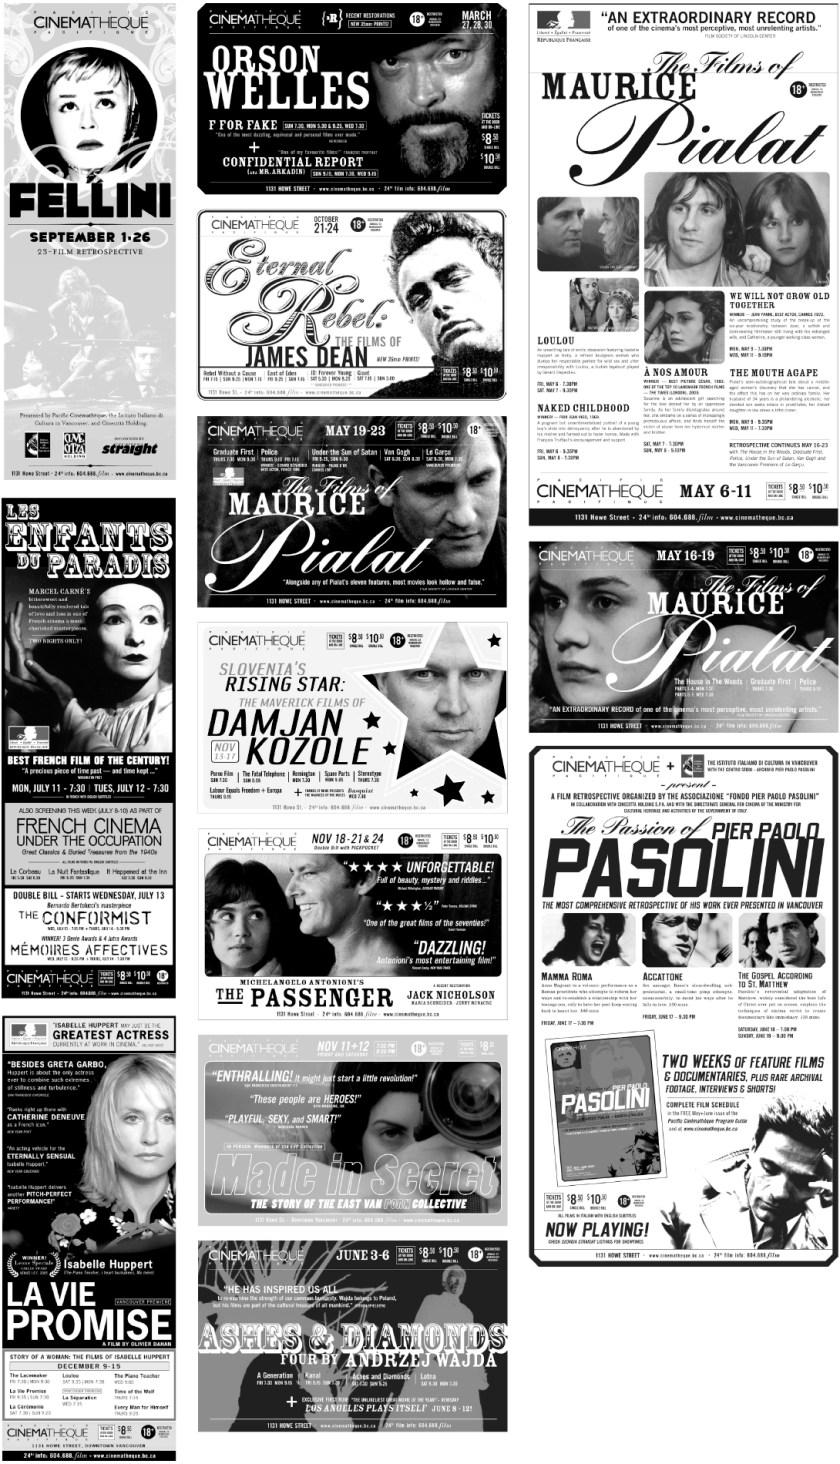 More Cinematheque Ad Slicks 2005